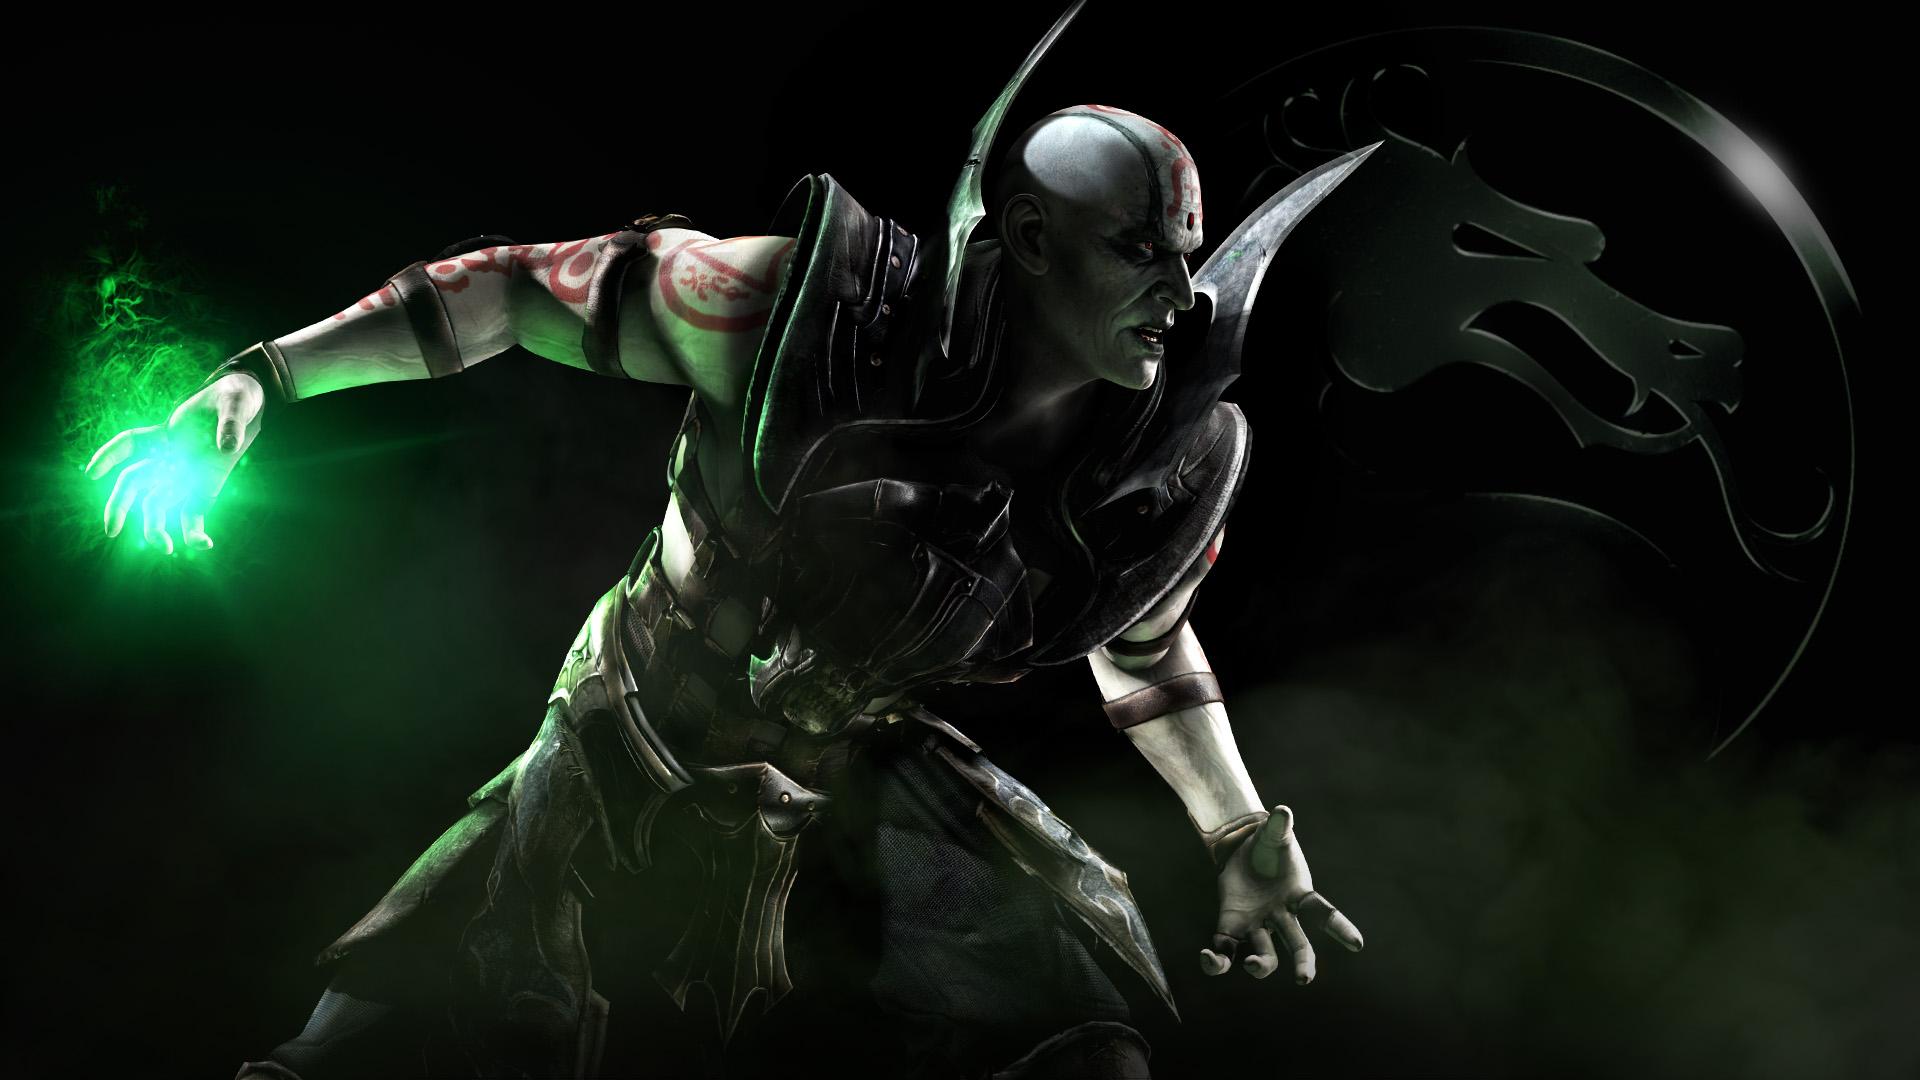 Mortal Kombat X Characters Kartos Wallpapers HD 1920x1080